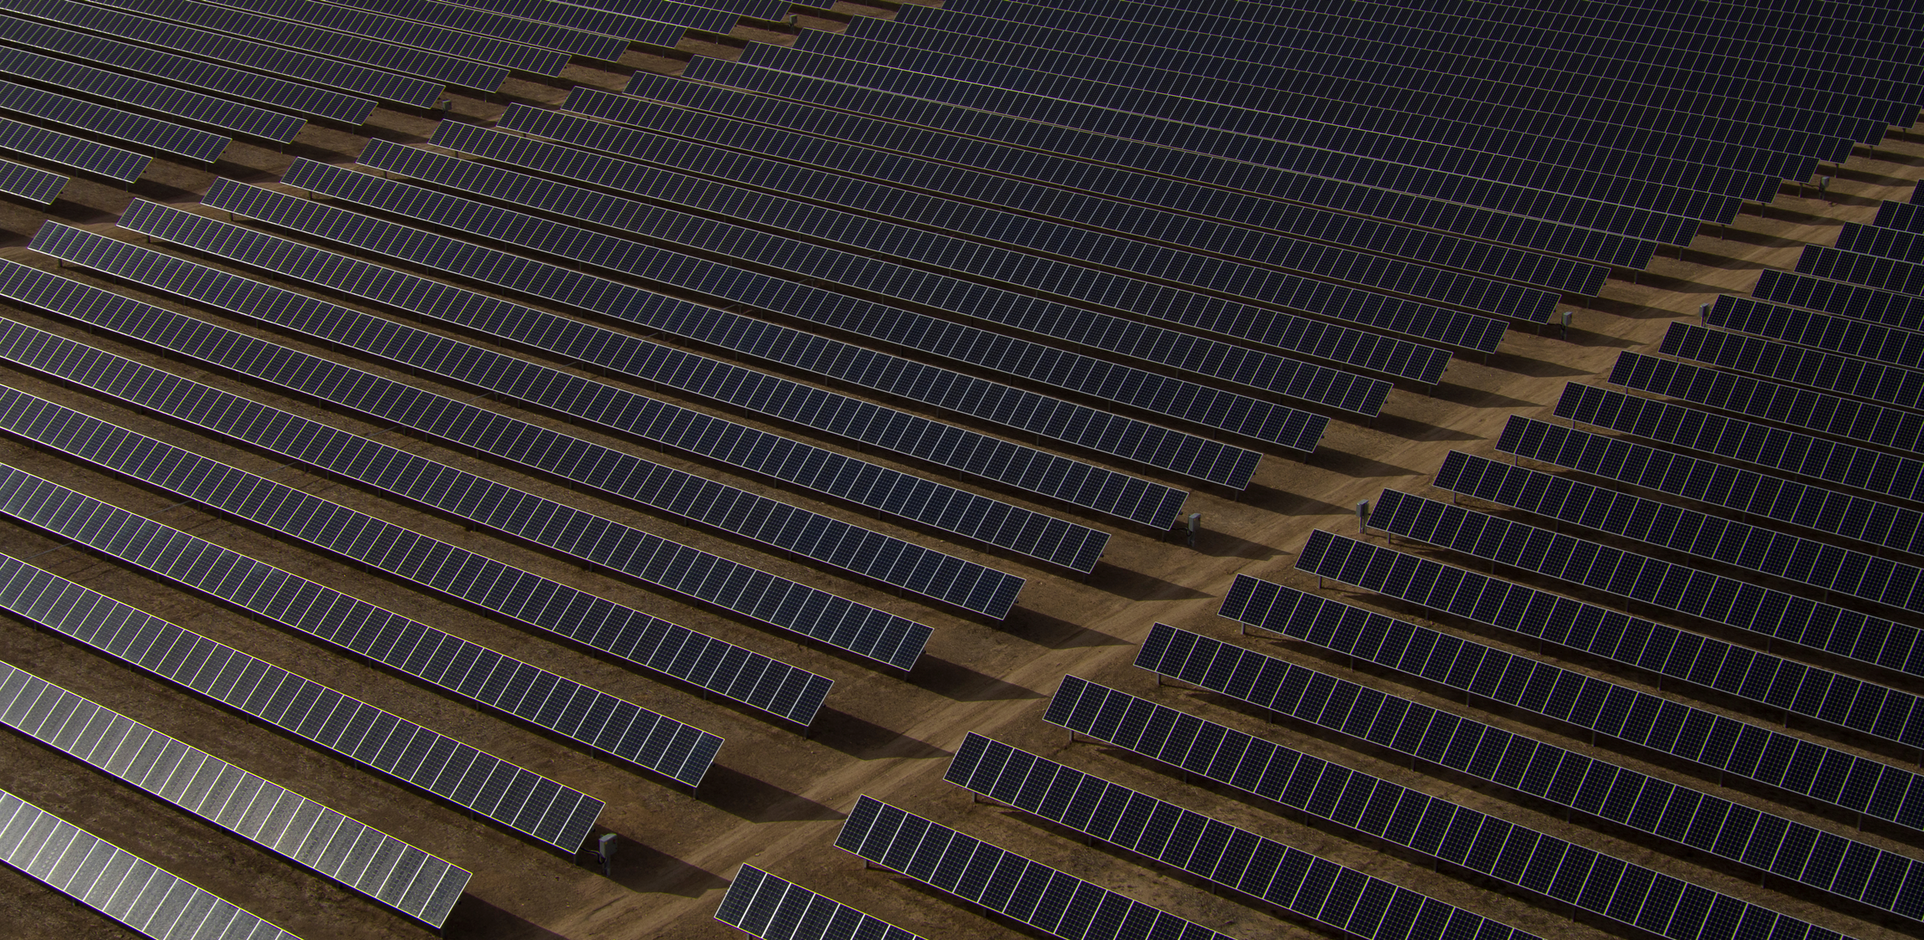 OPINIONS_solarfarm_unsplash